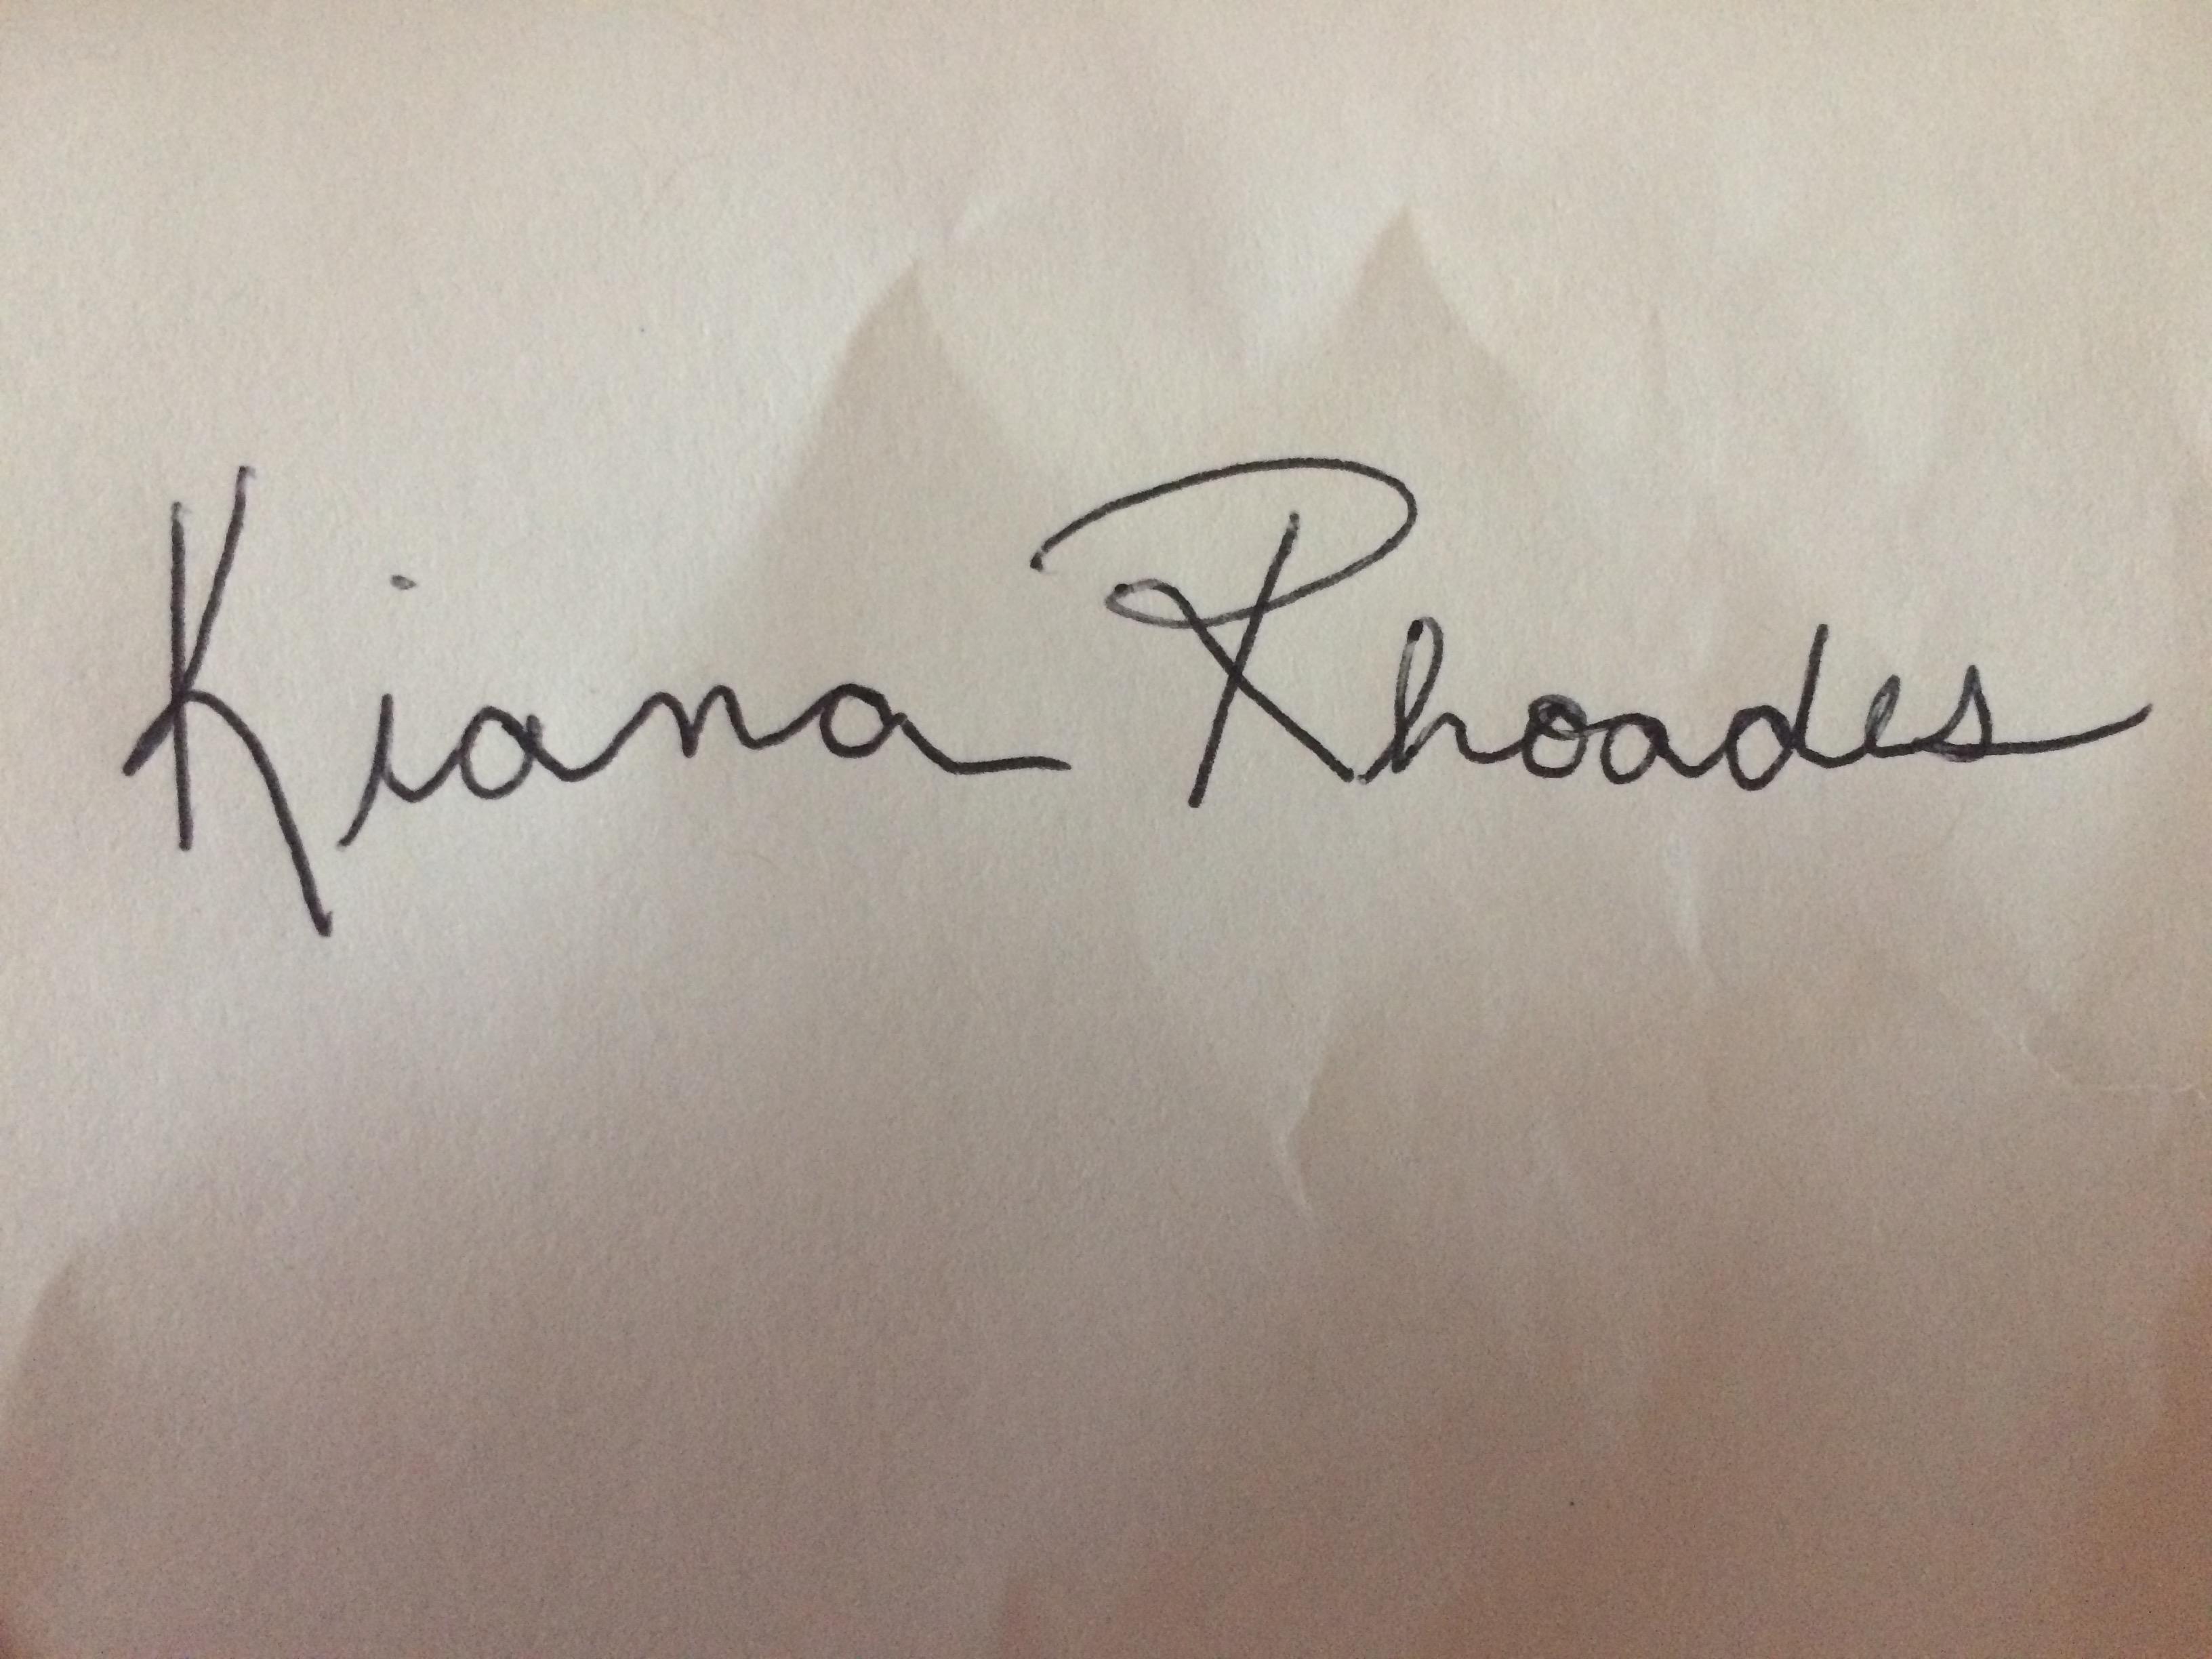 Kiana Rhoades's Signature